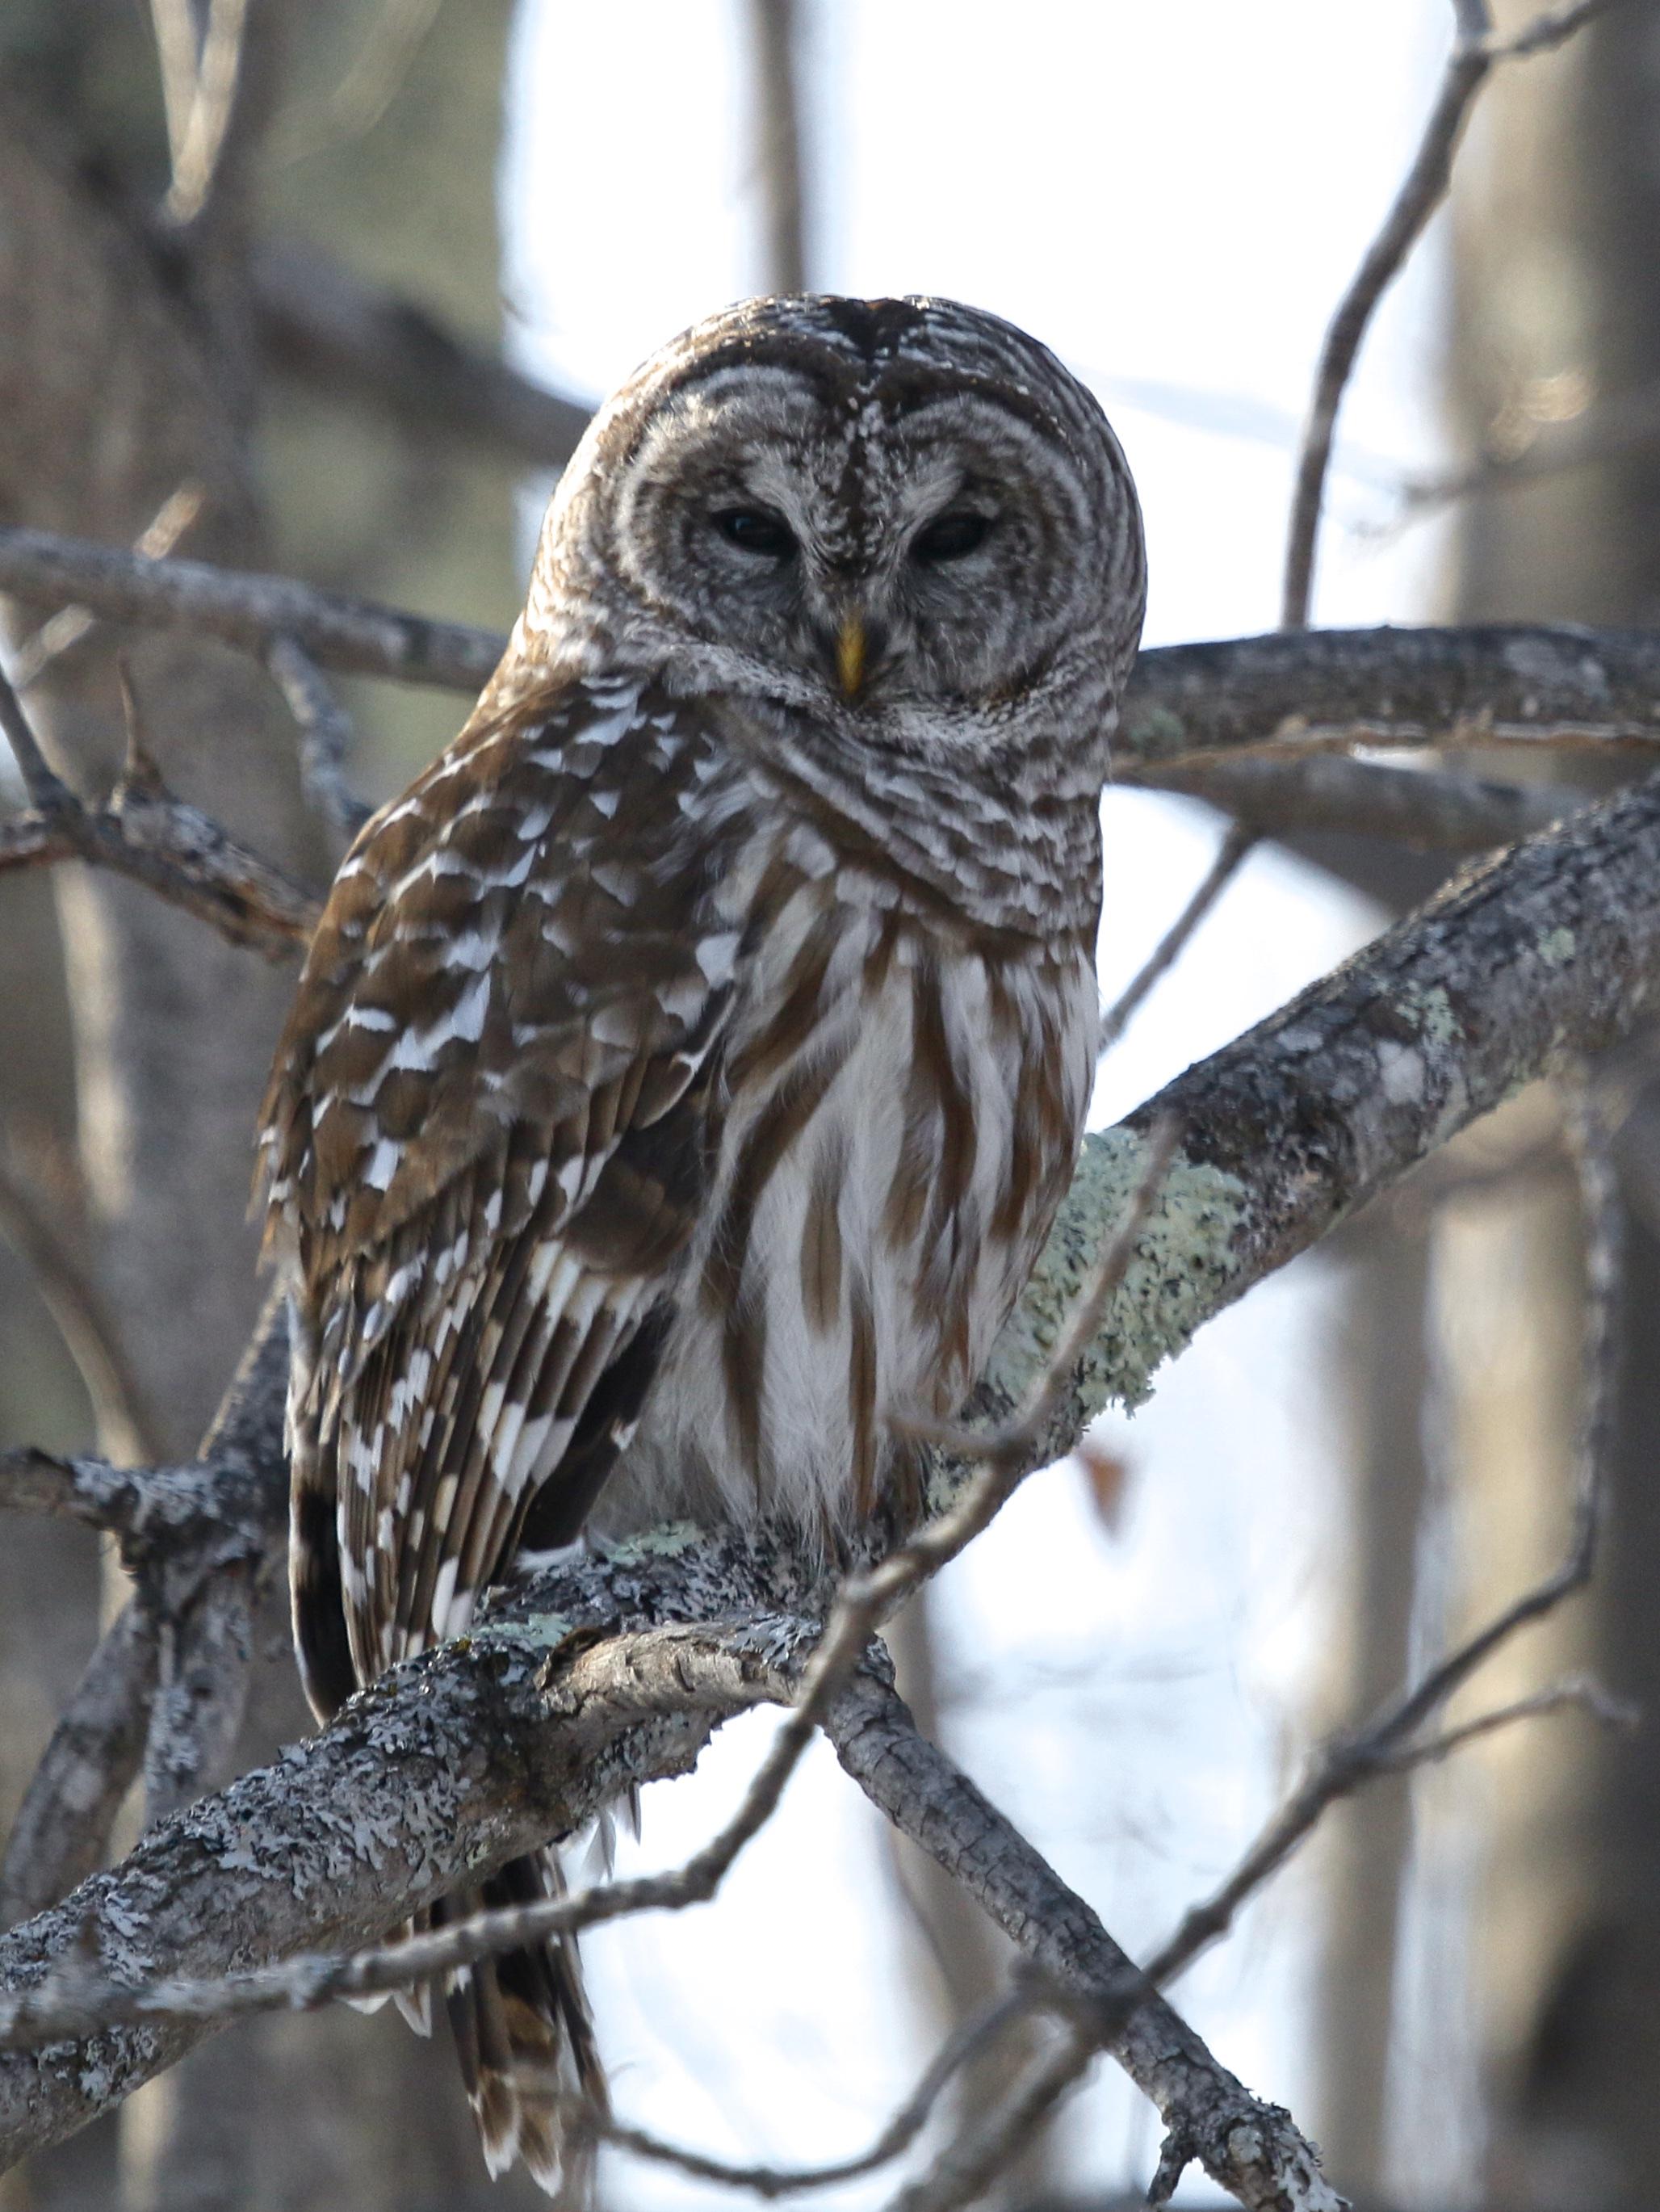 ~Barred Owl in Sullivan County, 3/24/15.~